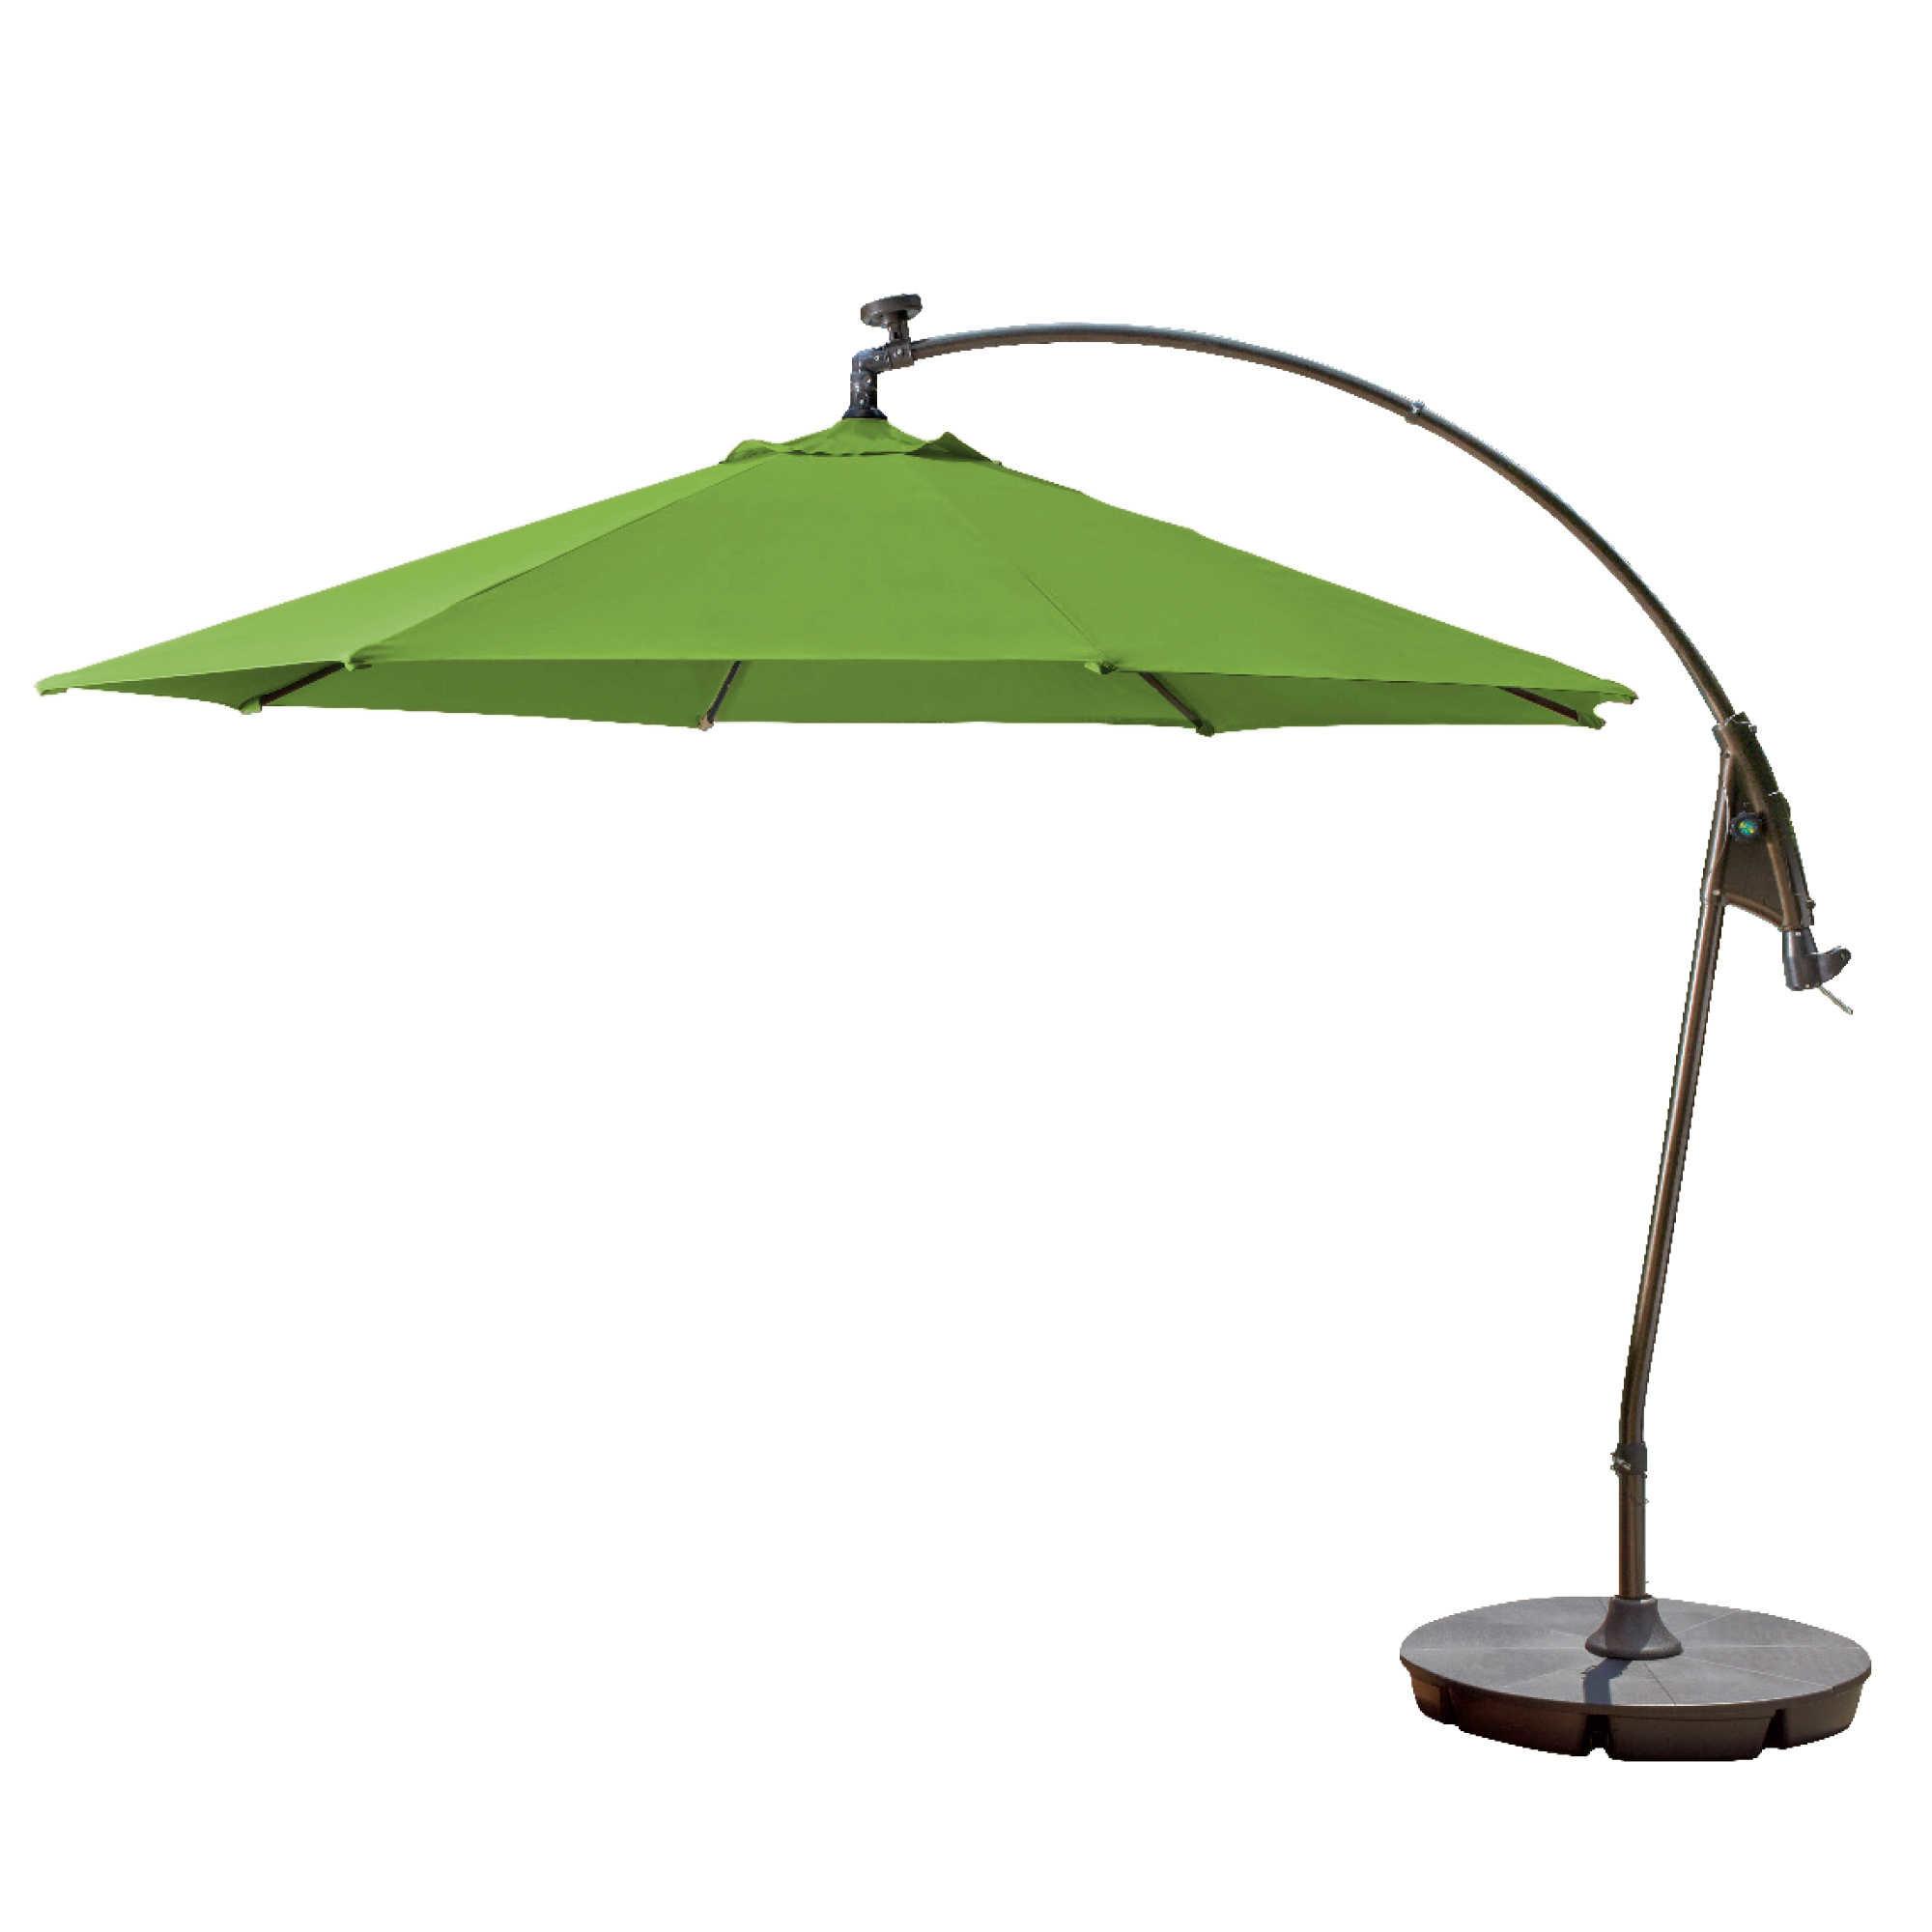 Emely Cantilever Umbrellas Pertaining To Most Current Pottsville Solar Cantilever Sunbrella Umbrella (View 7 of 20)